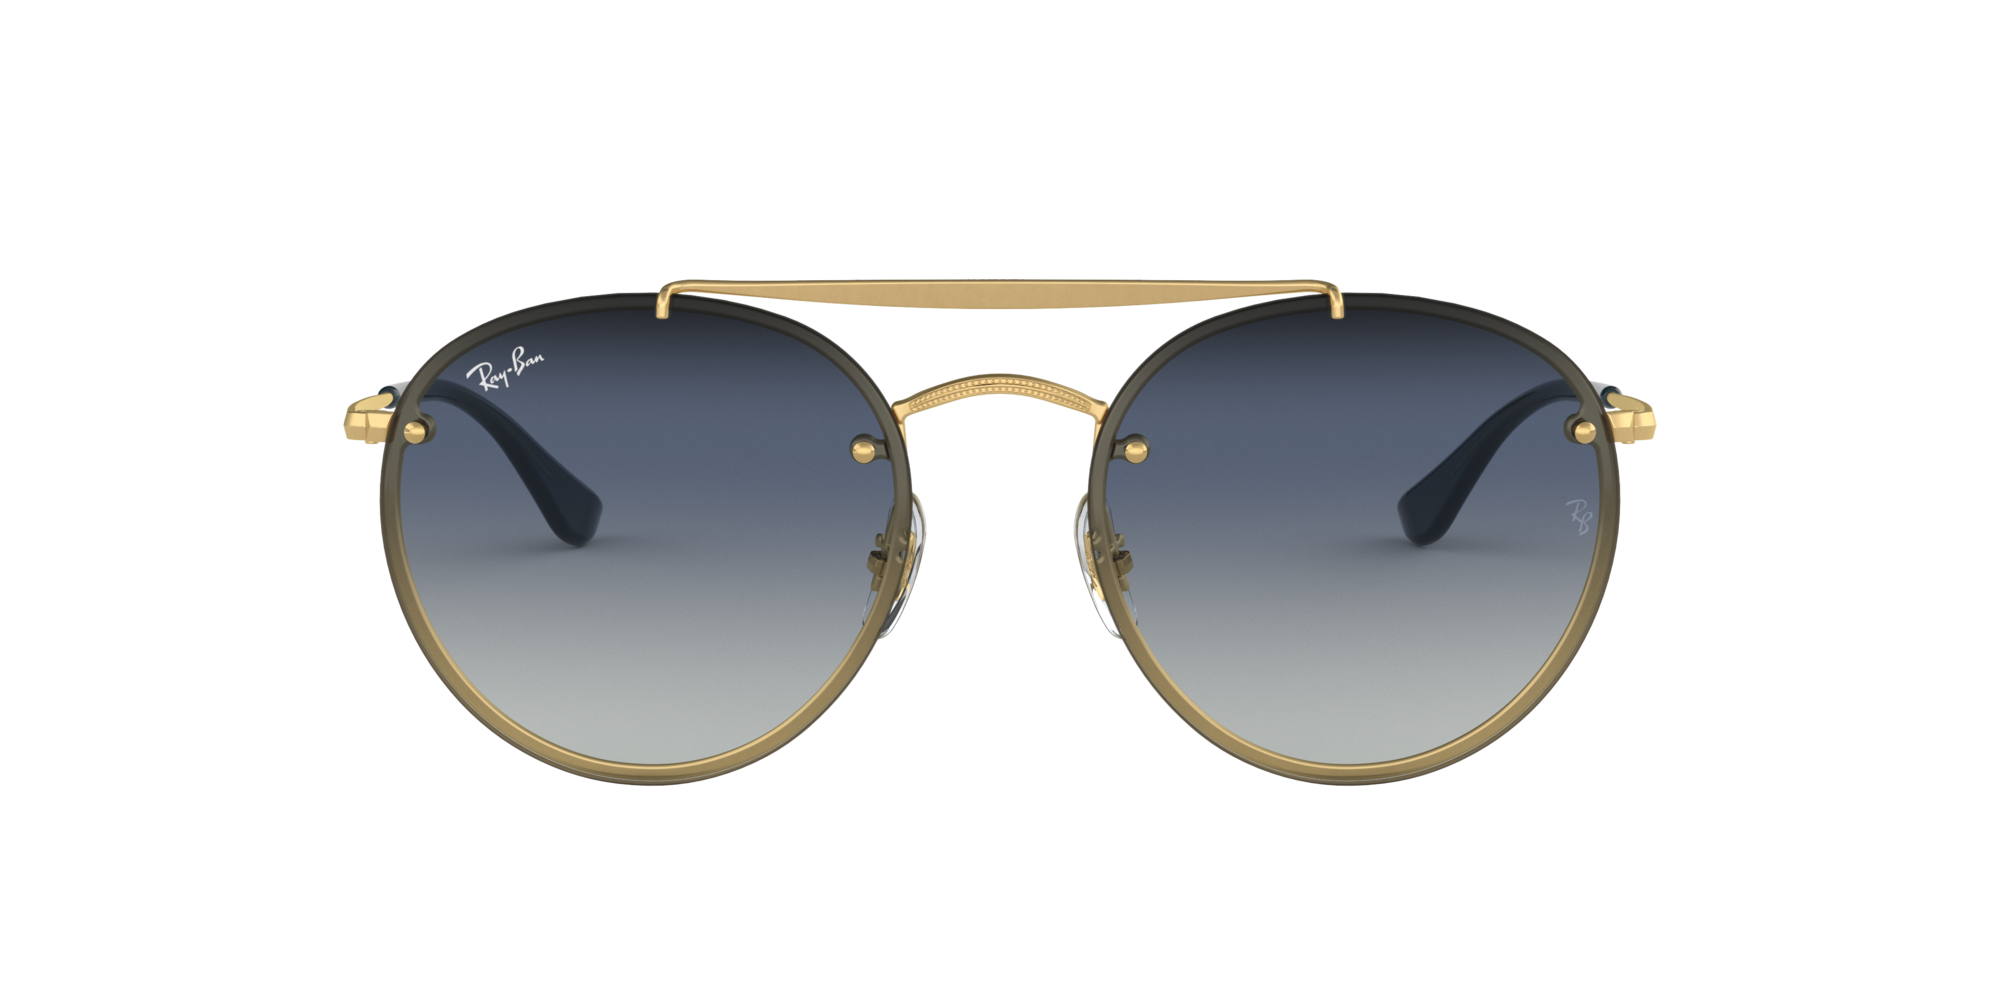 Image for RB3614N 54 BLAZE ROUND DOUBLEBRIDGE from LensCrafters | Glasses, Prescription Glasses Online, Eyewear